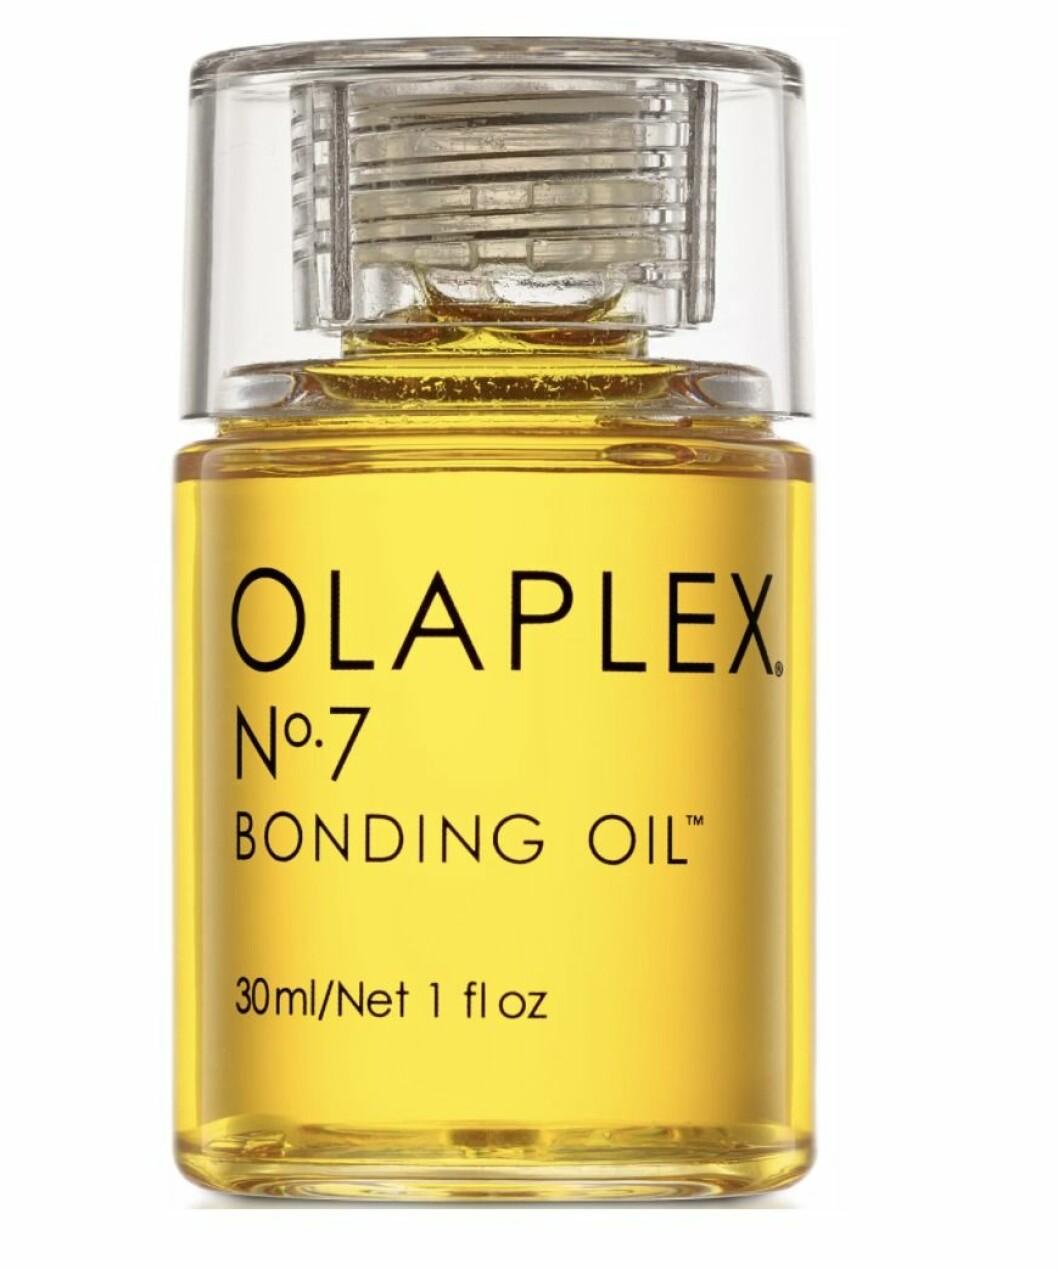 No7 bonding oil från Olaplex